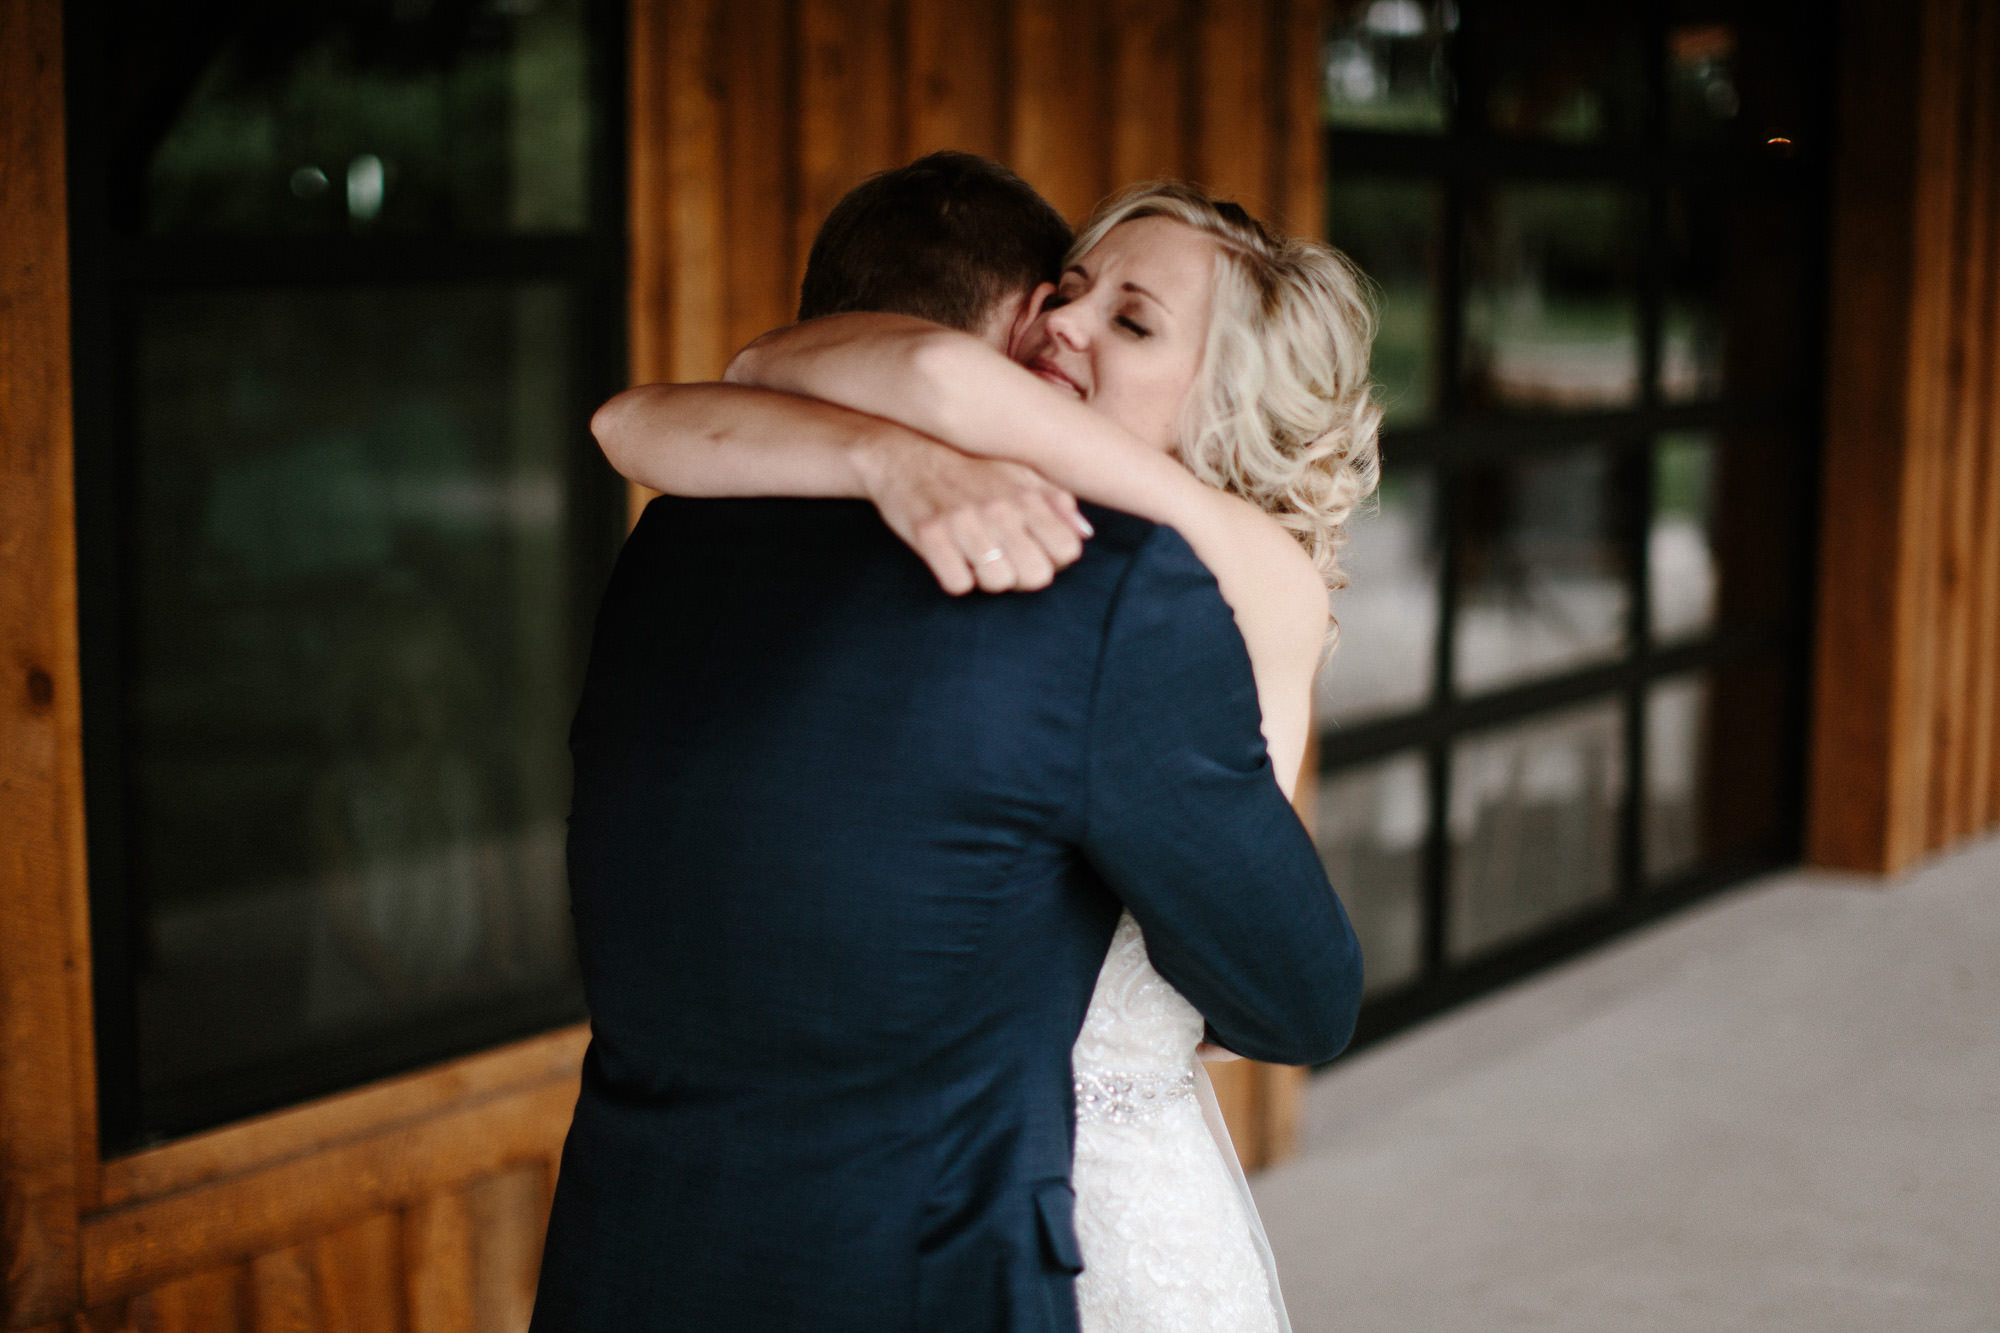 meadow-barn-wedding-sioux-falls-south-dakota-romantic-adventerous-michael-liedtke-photography022.jpg